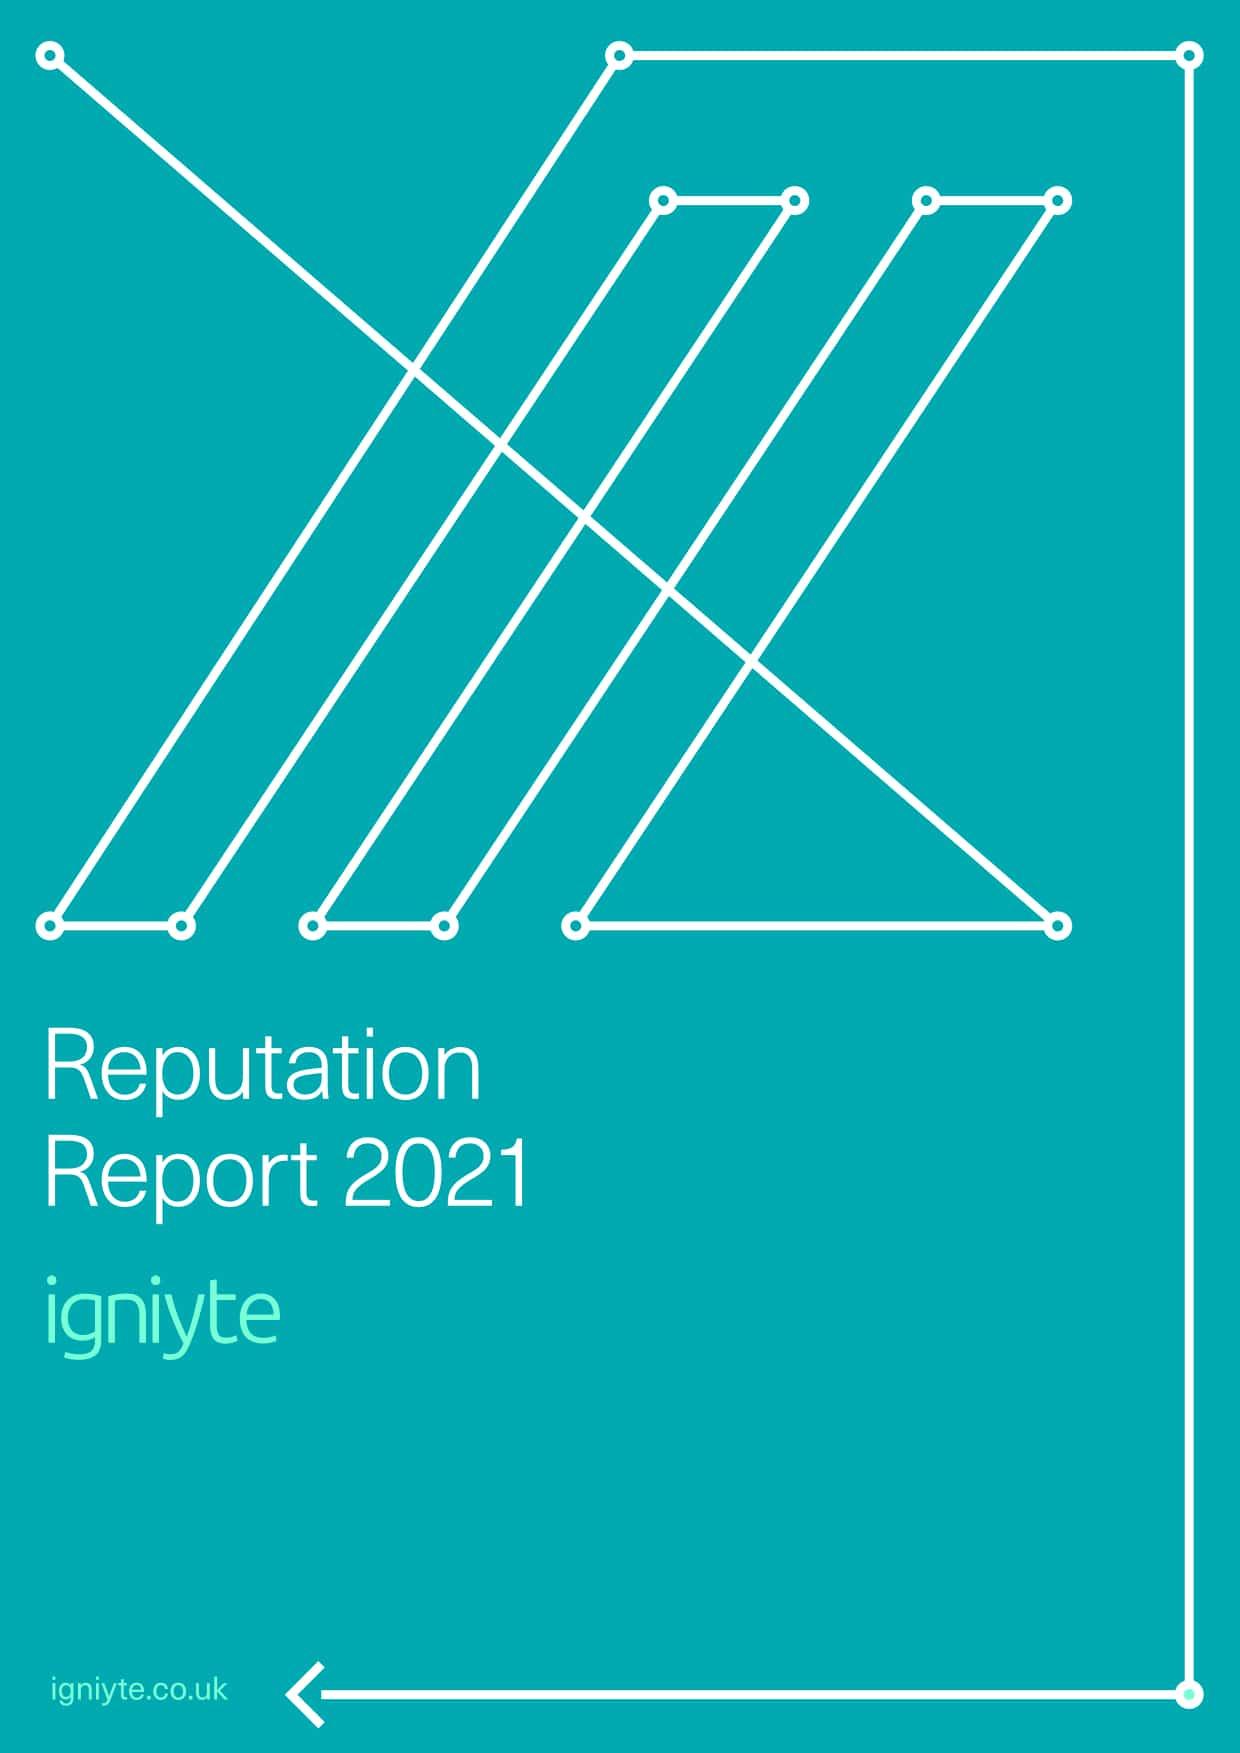 The Reputation Report - 2021